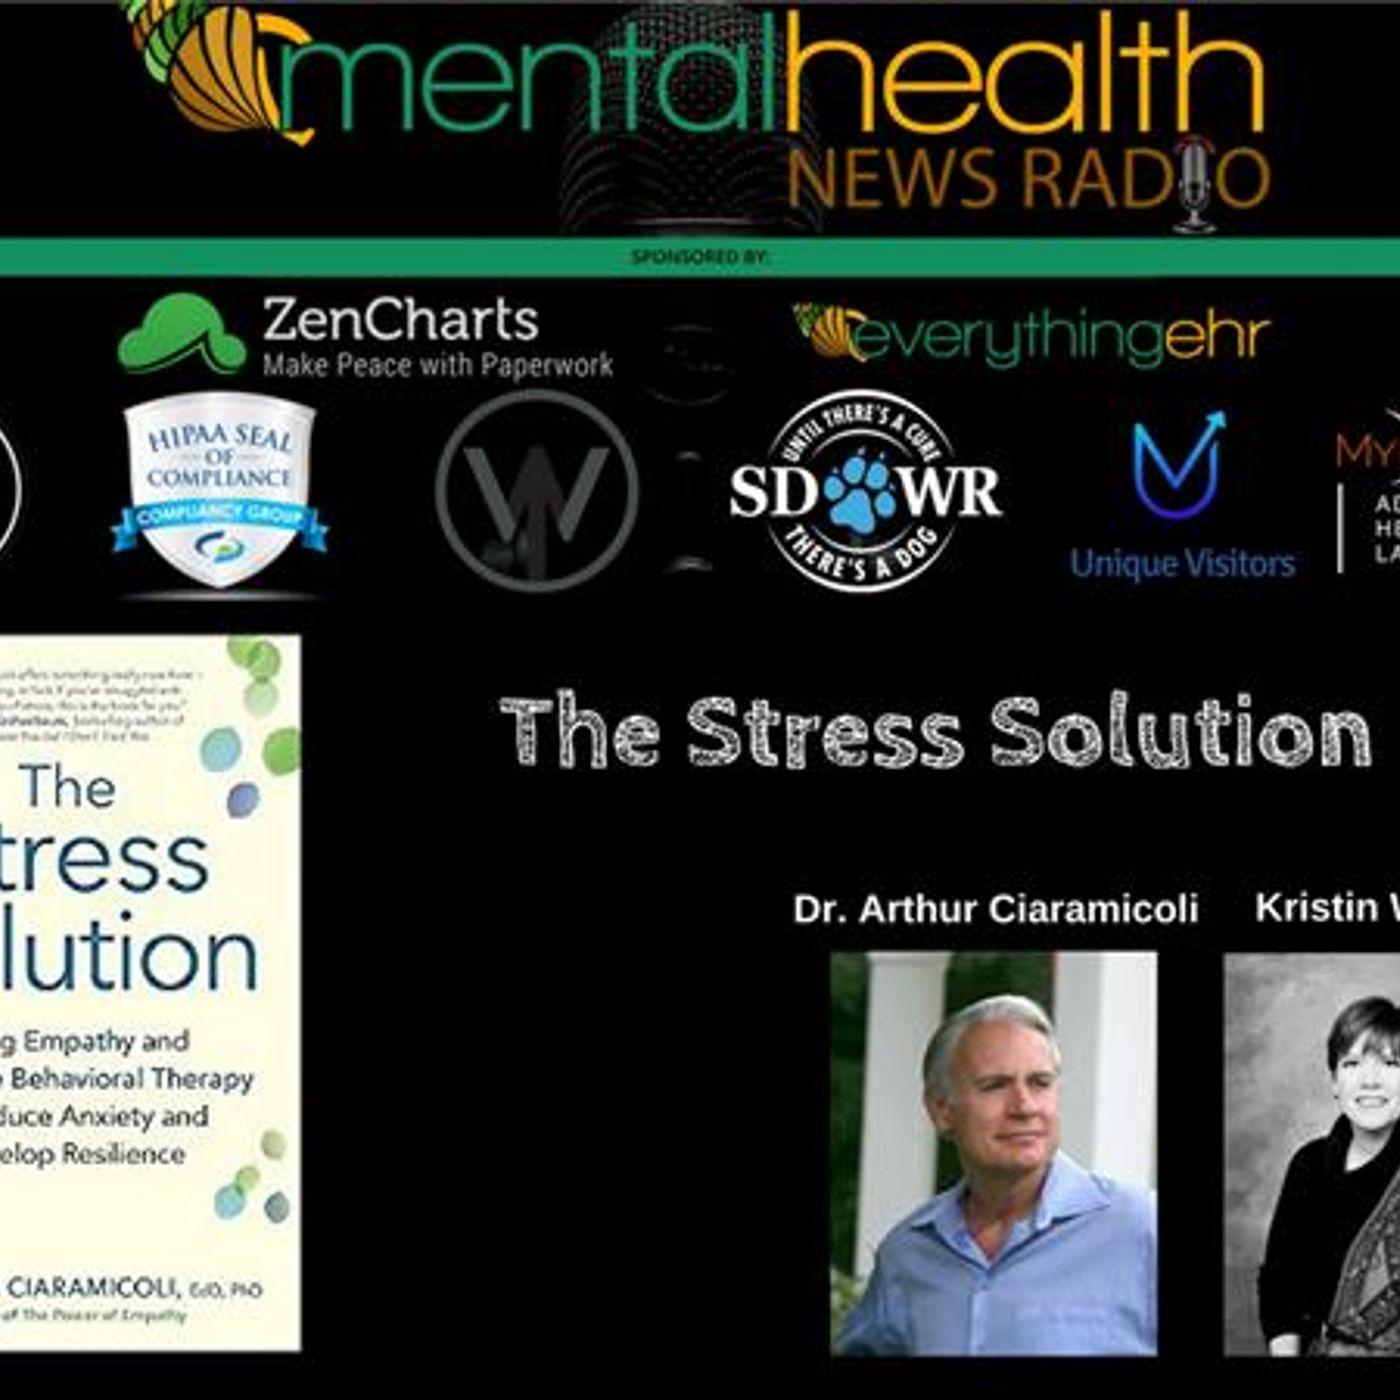 Mental Health News Radio - The Stress Solution with Dr. Arthur Ciaramicoli